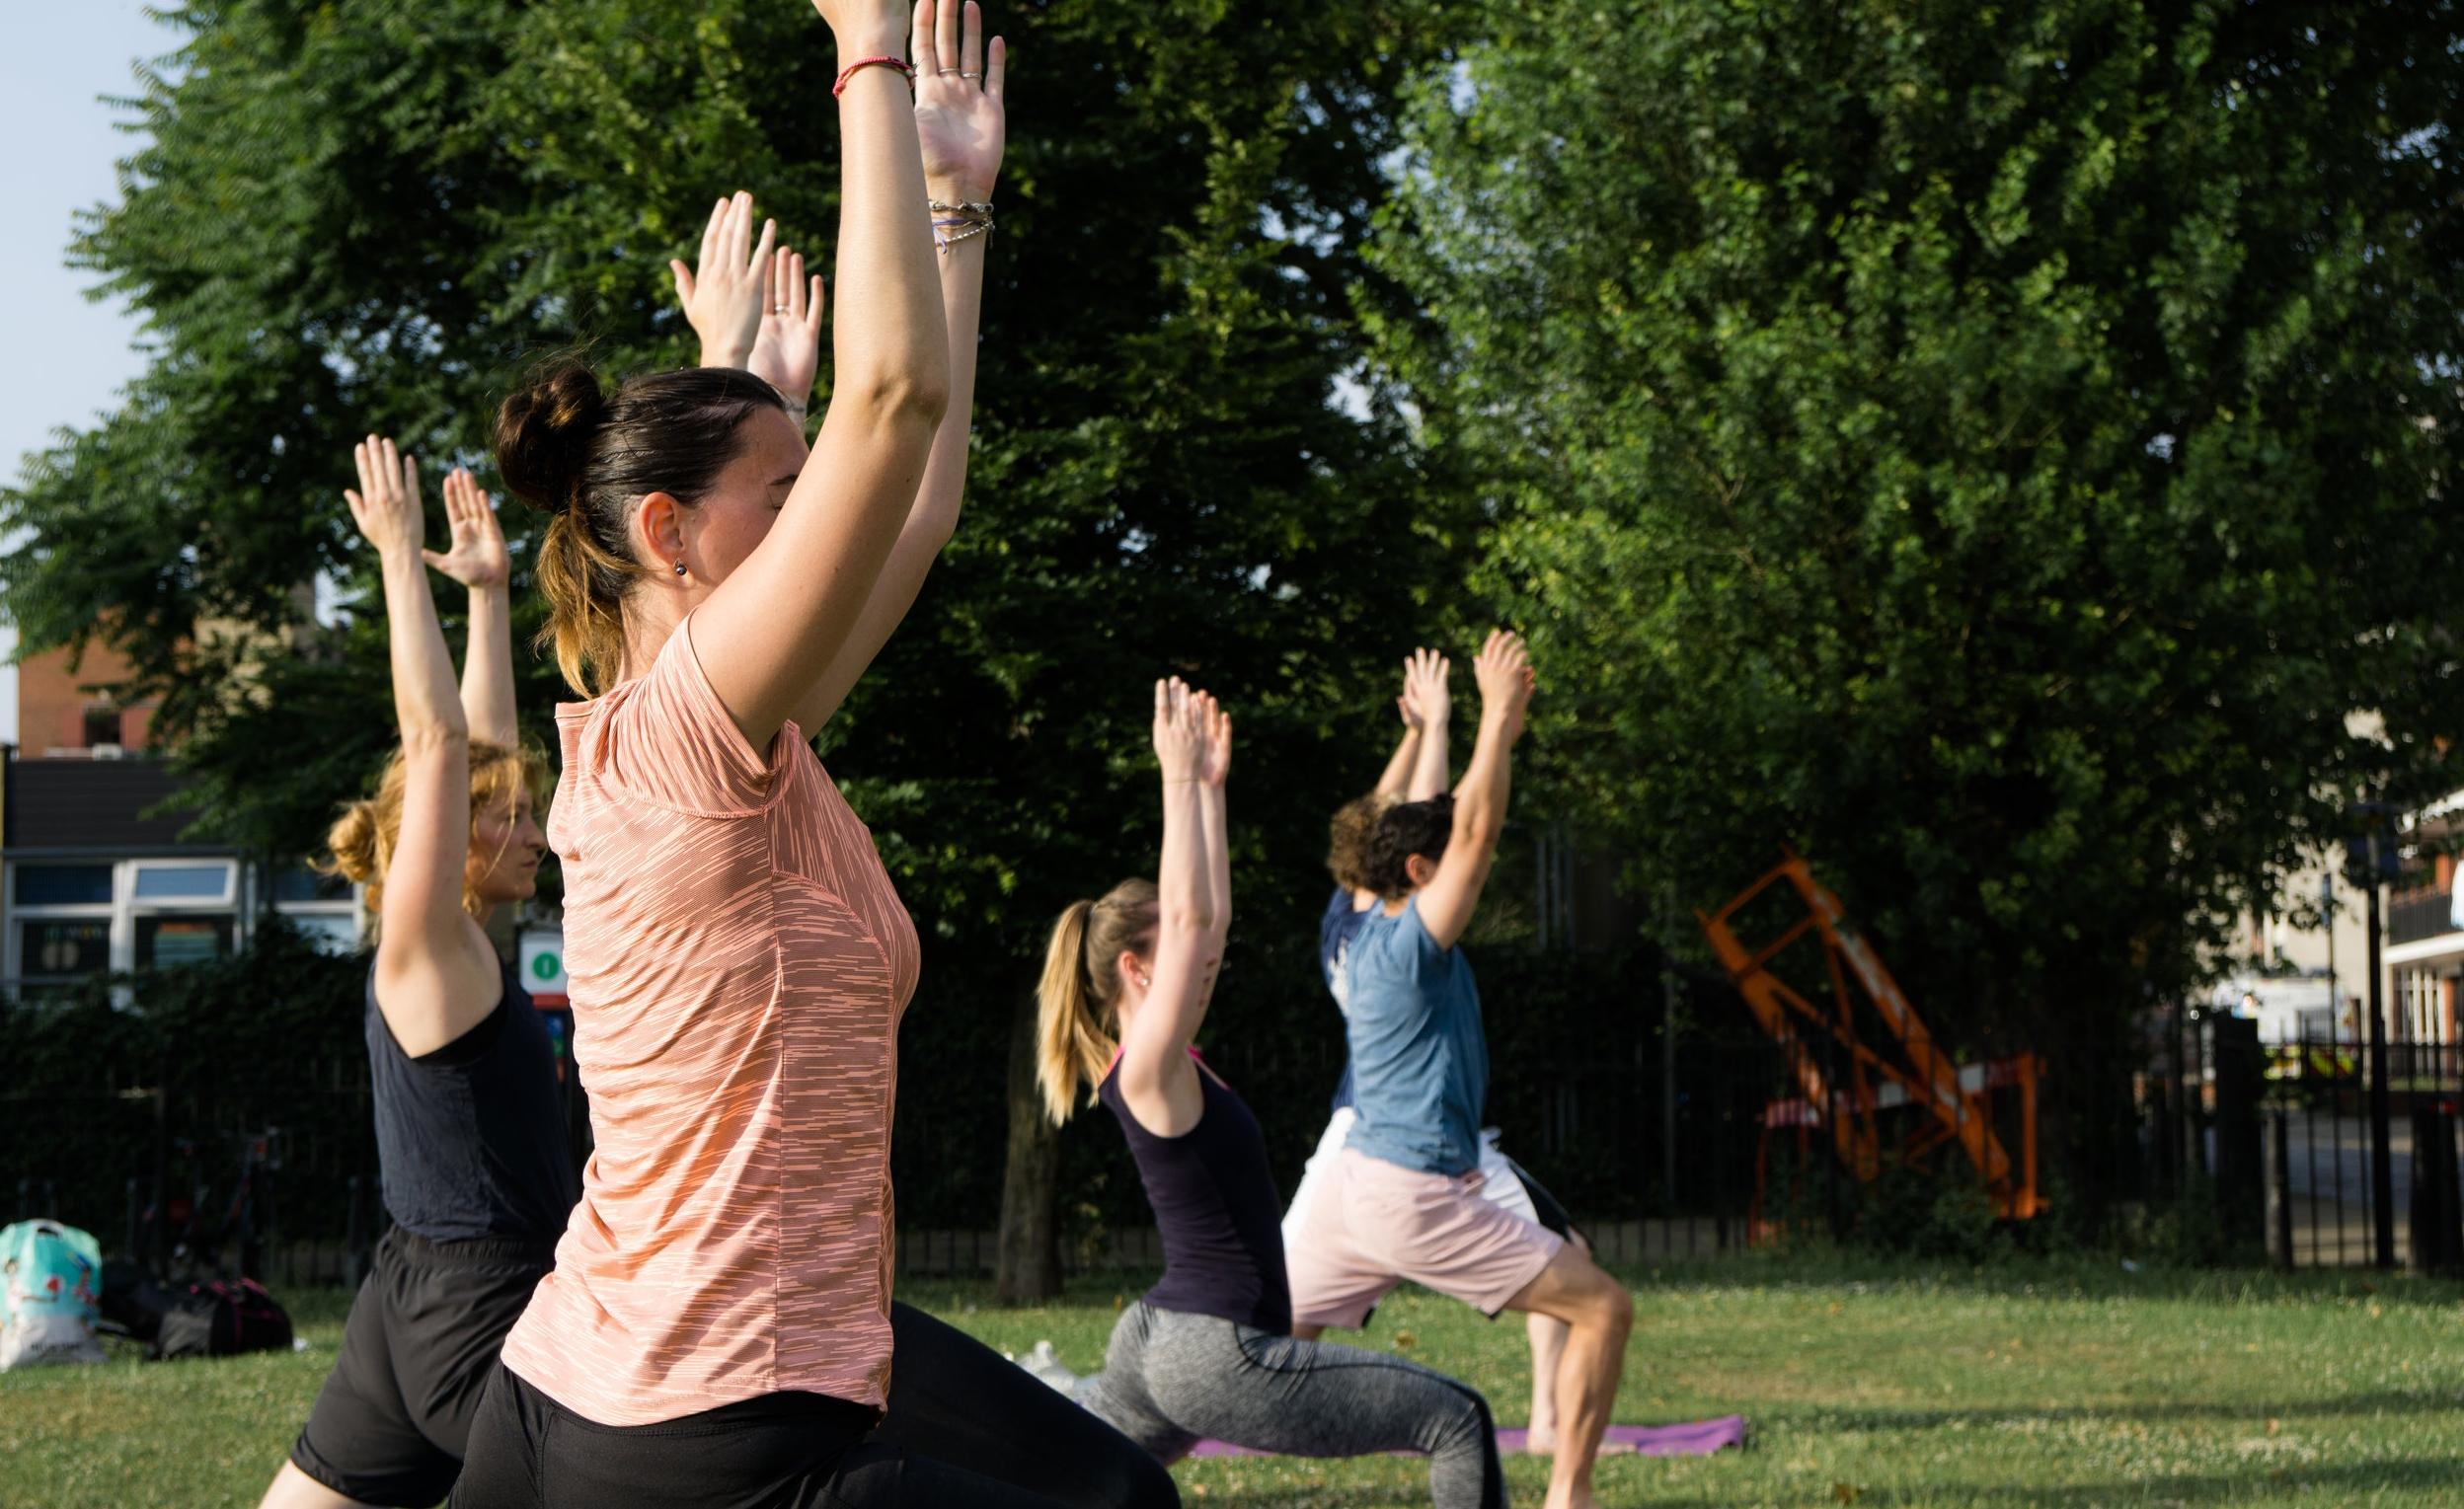 2 - Watch some yoga videos online